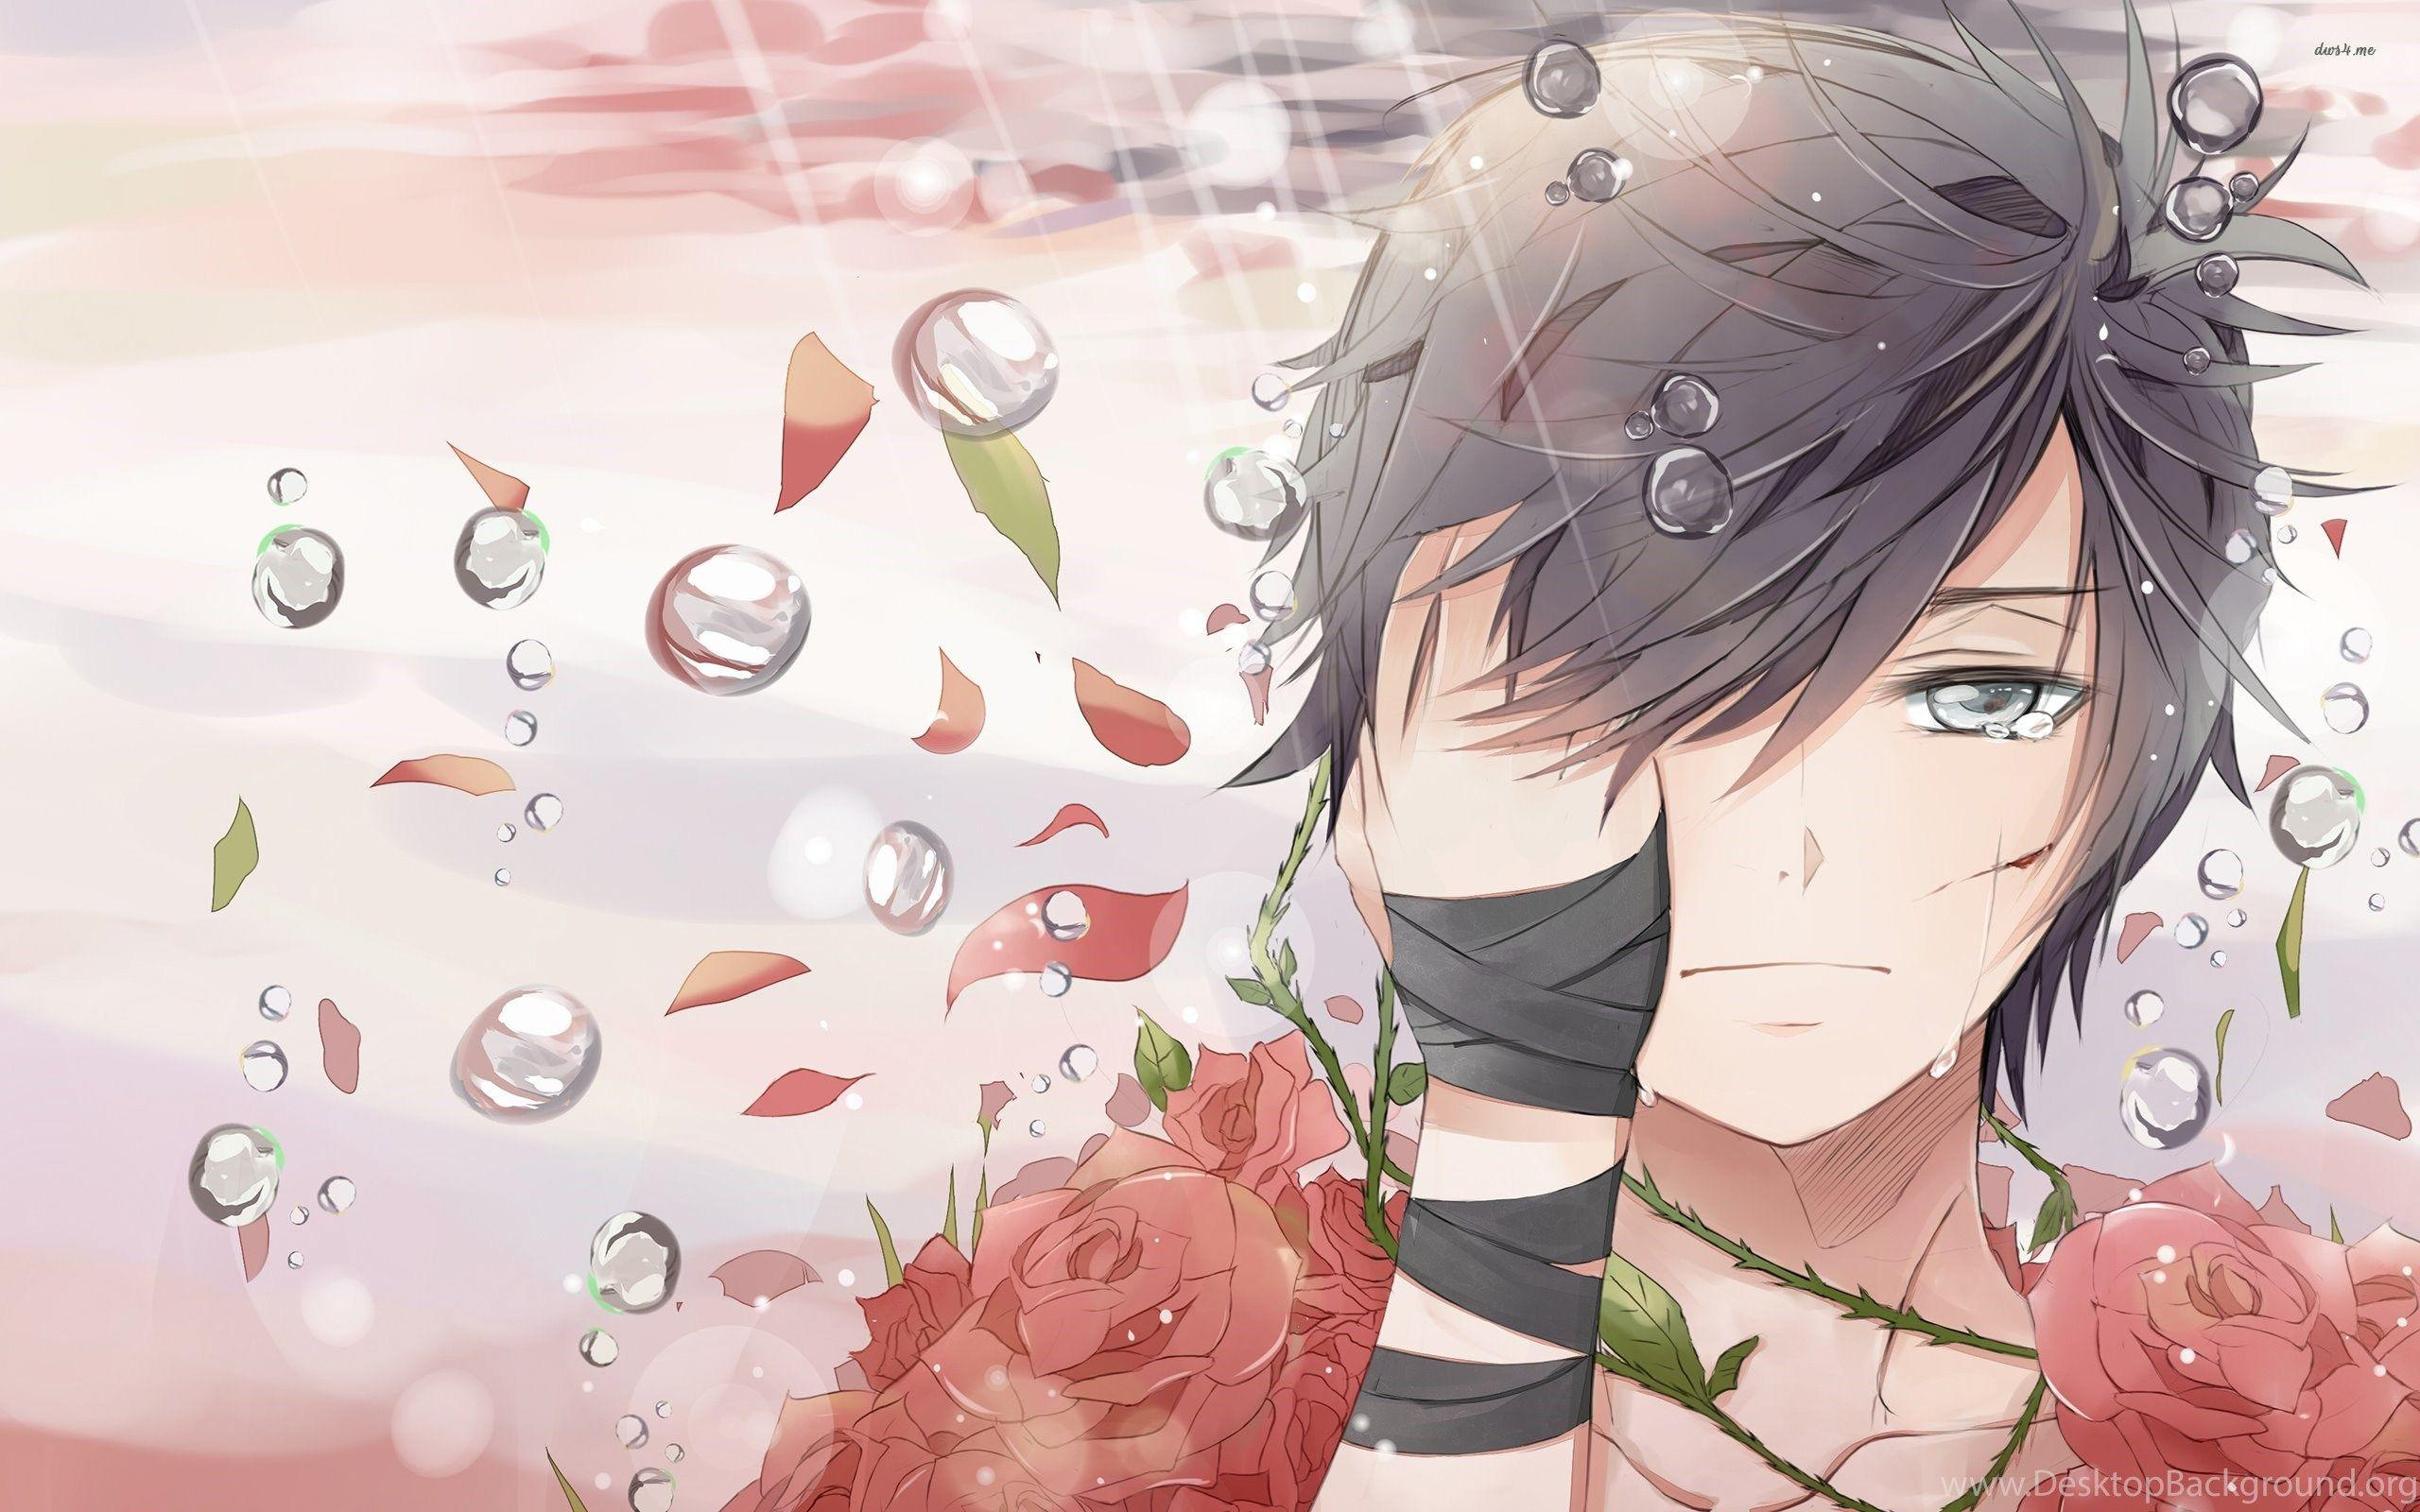 Anime Boy Sad Wallpapers - Wallpaper Cave